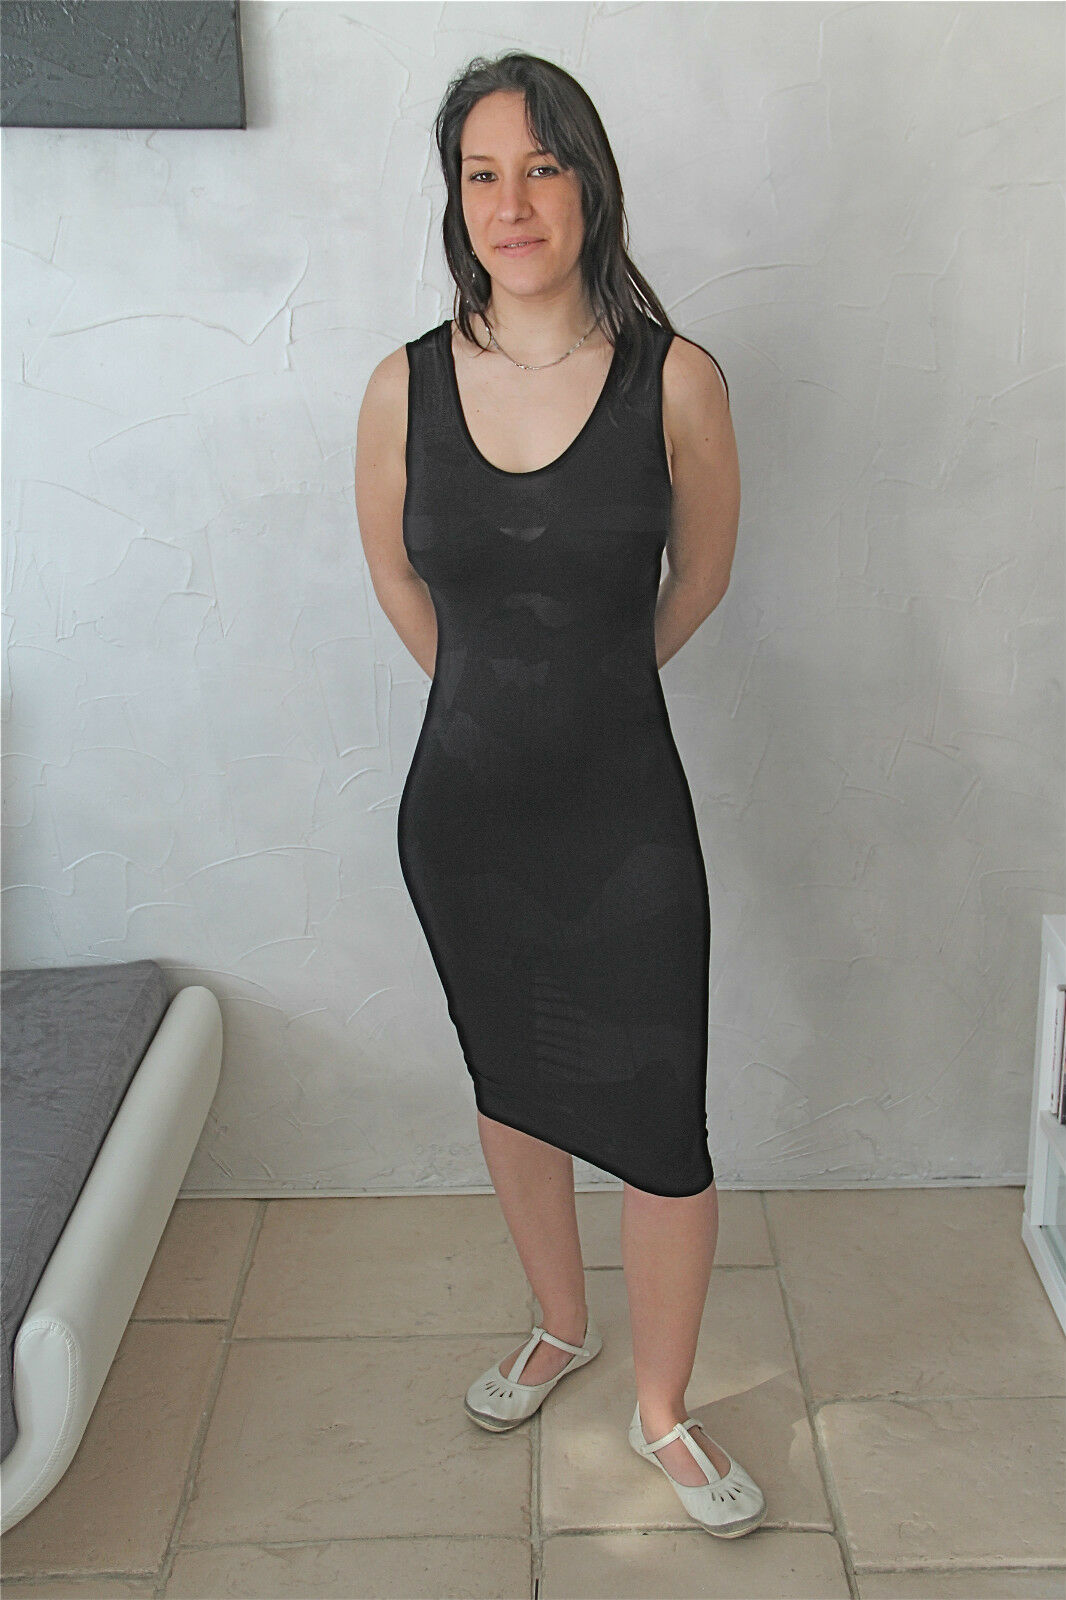 Dress robe schwarze stretch MARITHE FRANCOIS GIRBAUD Größe 3  40   NEUVE ÉTIQUETTE